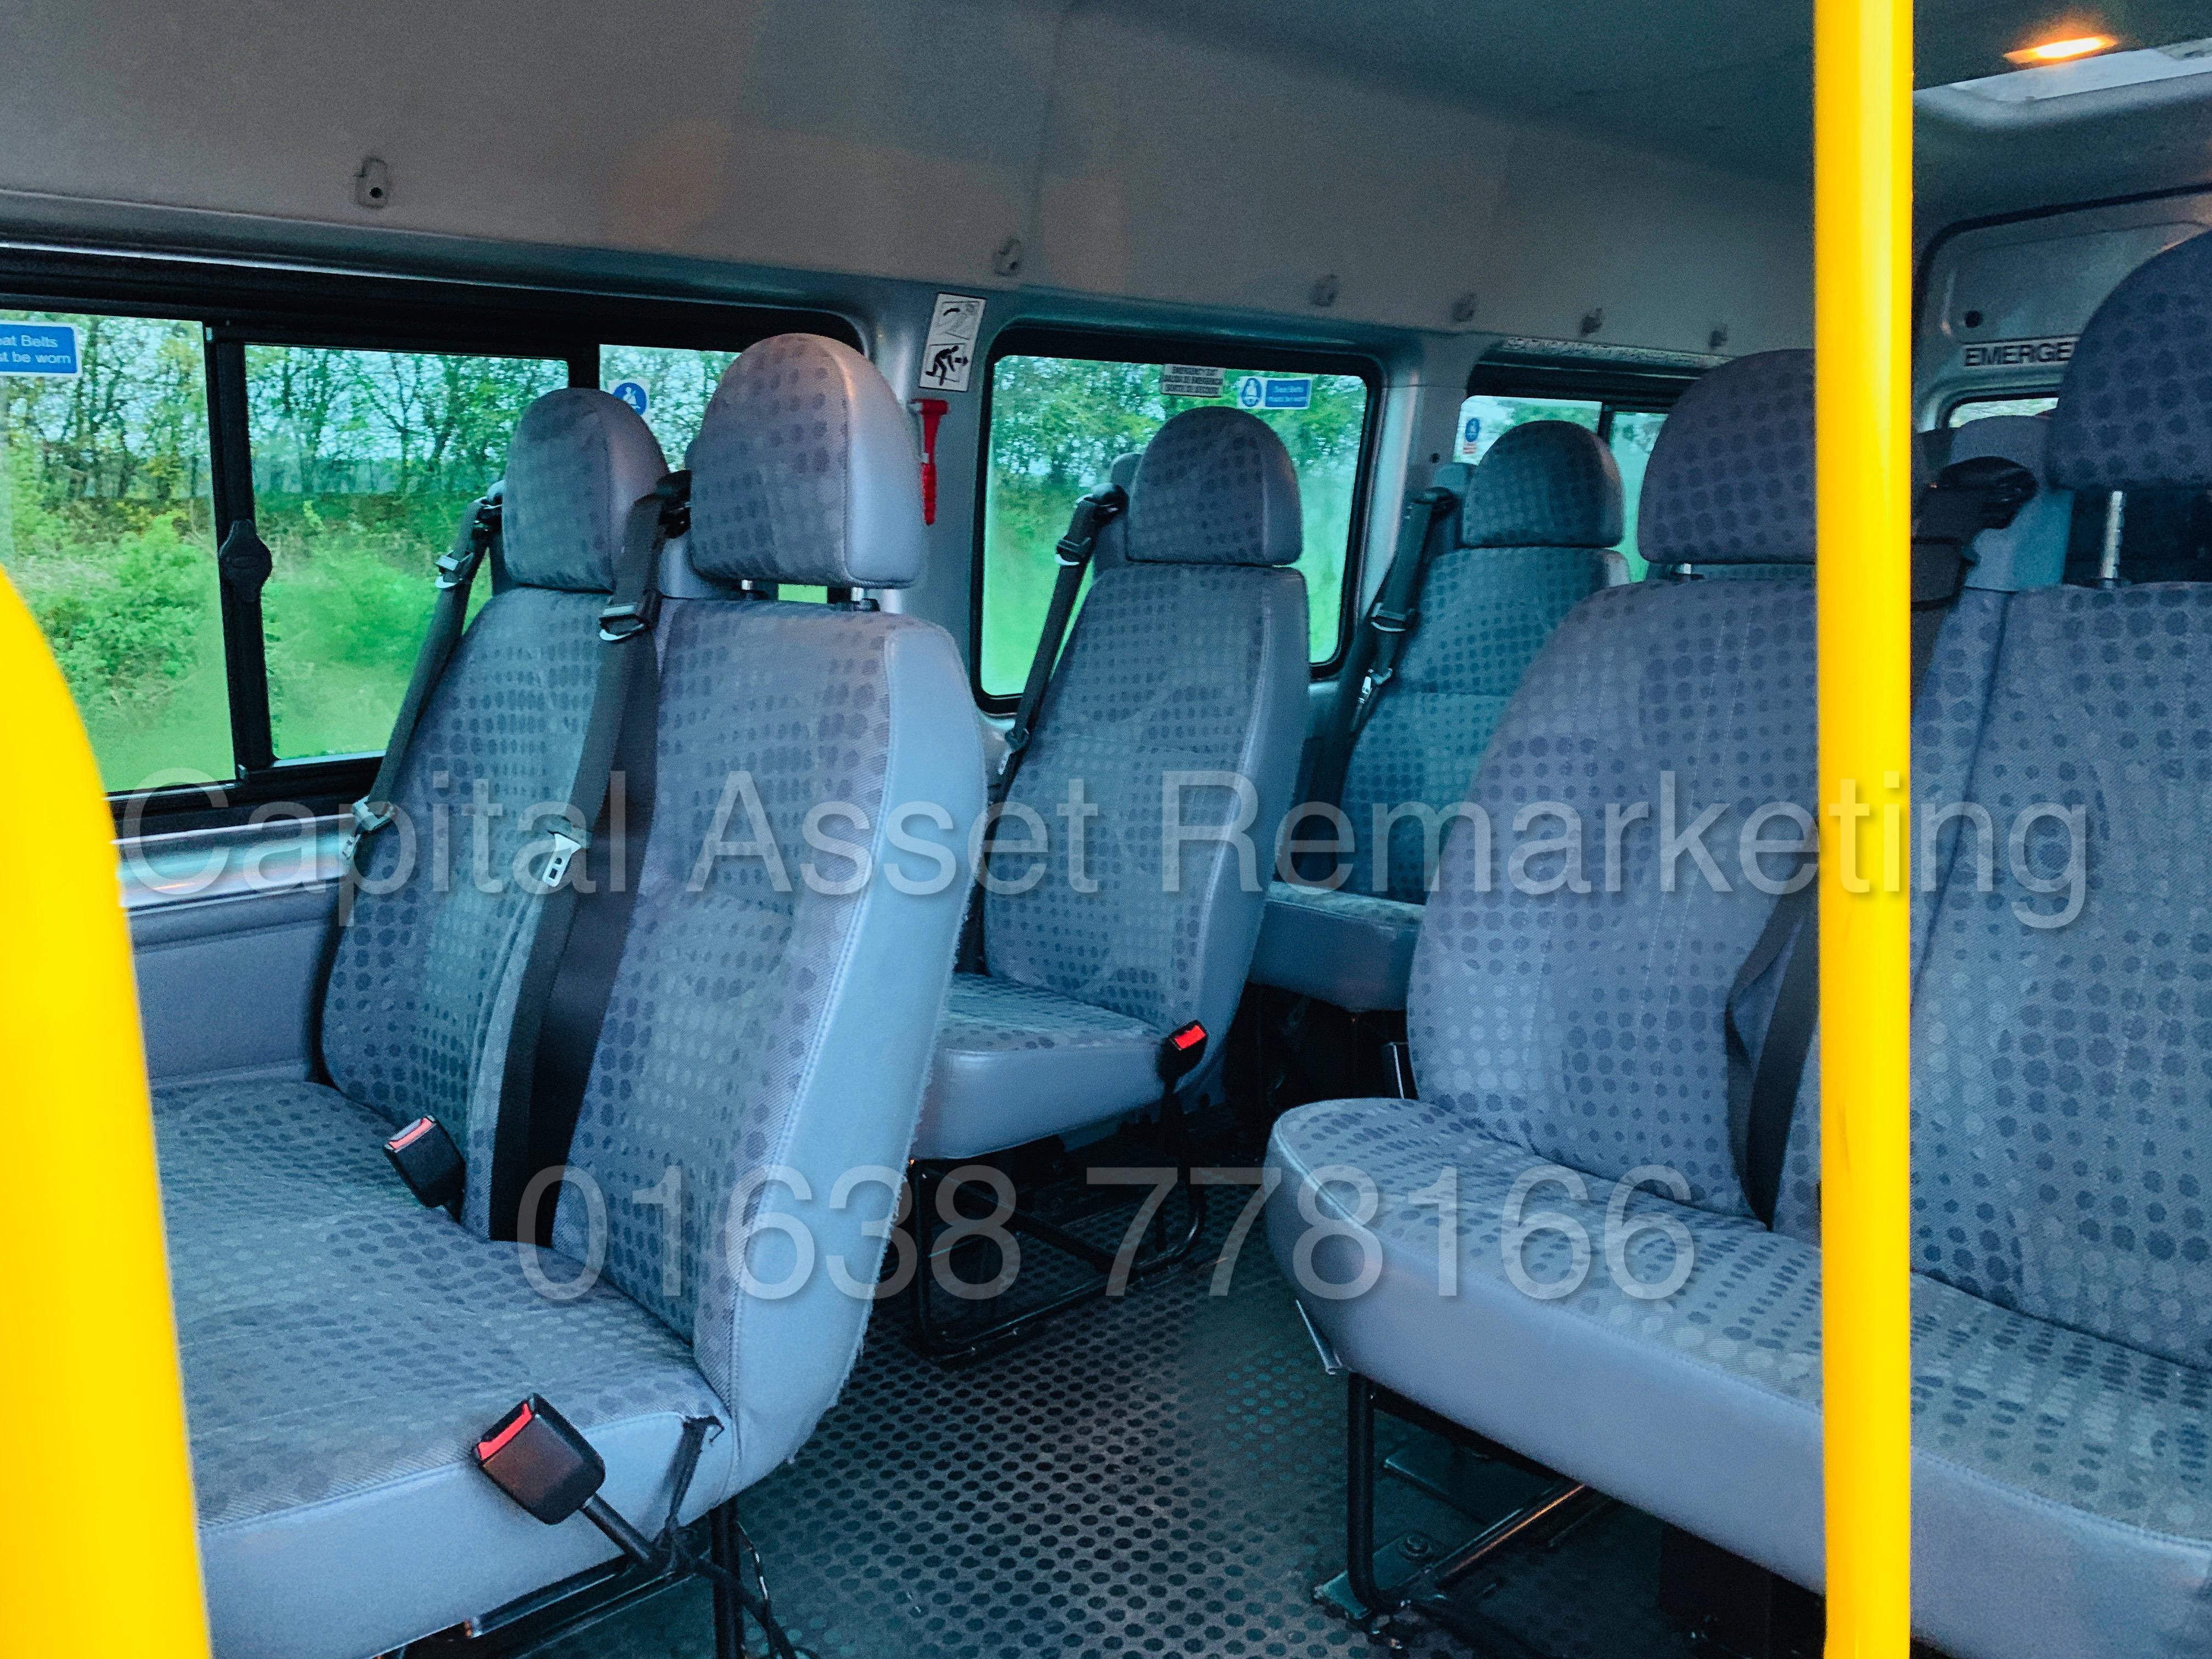 FORD TRANSIT 135 T430 RWD *XLWB -17 SEATER MINI-BUS* (2013) '2.2 TDCI - 135 BHP - 6 SPEED' (1 OWNER) - Image 24 of 43